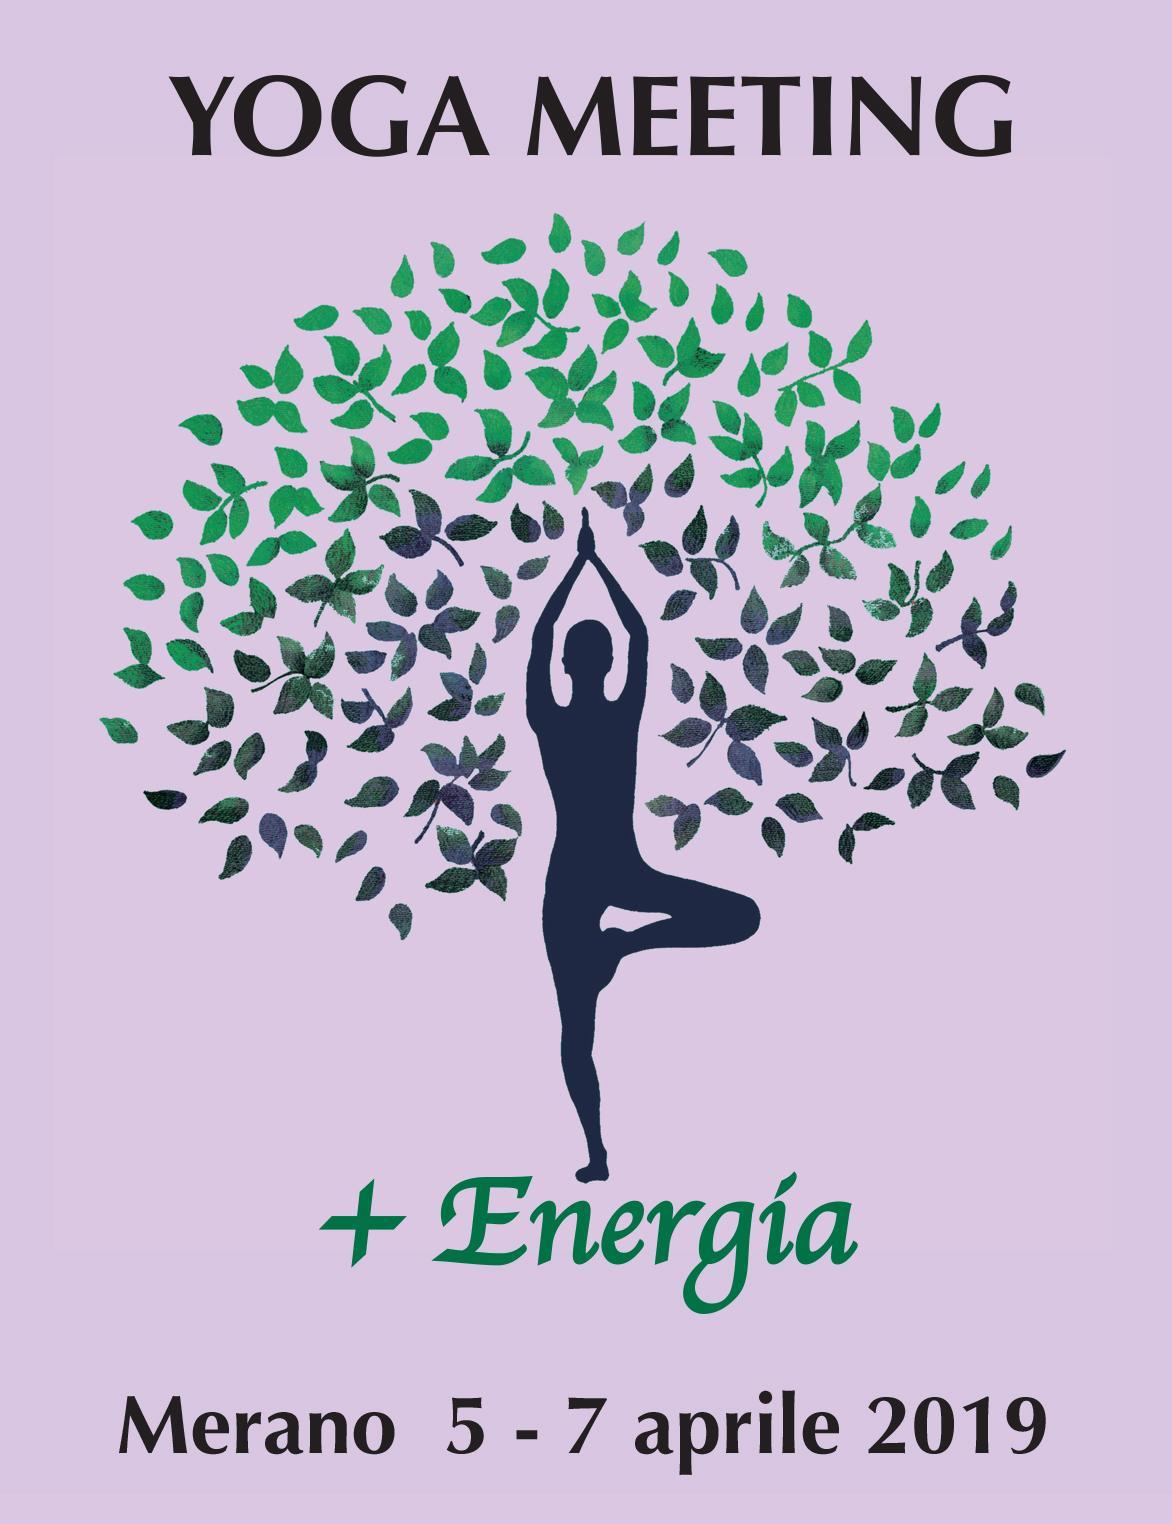 yoga meeting 2019 merano